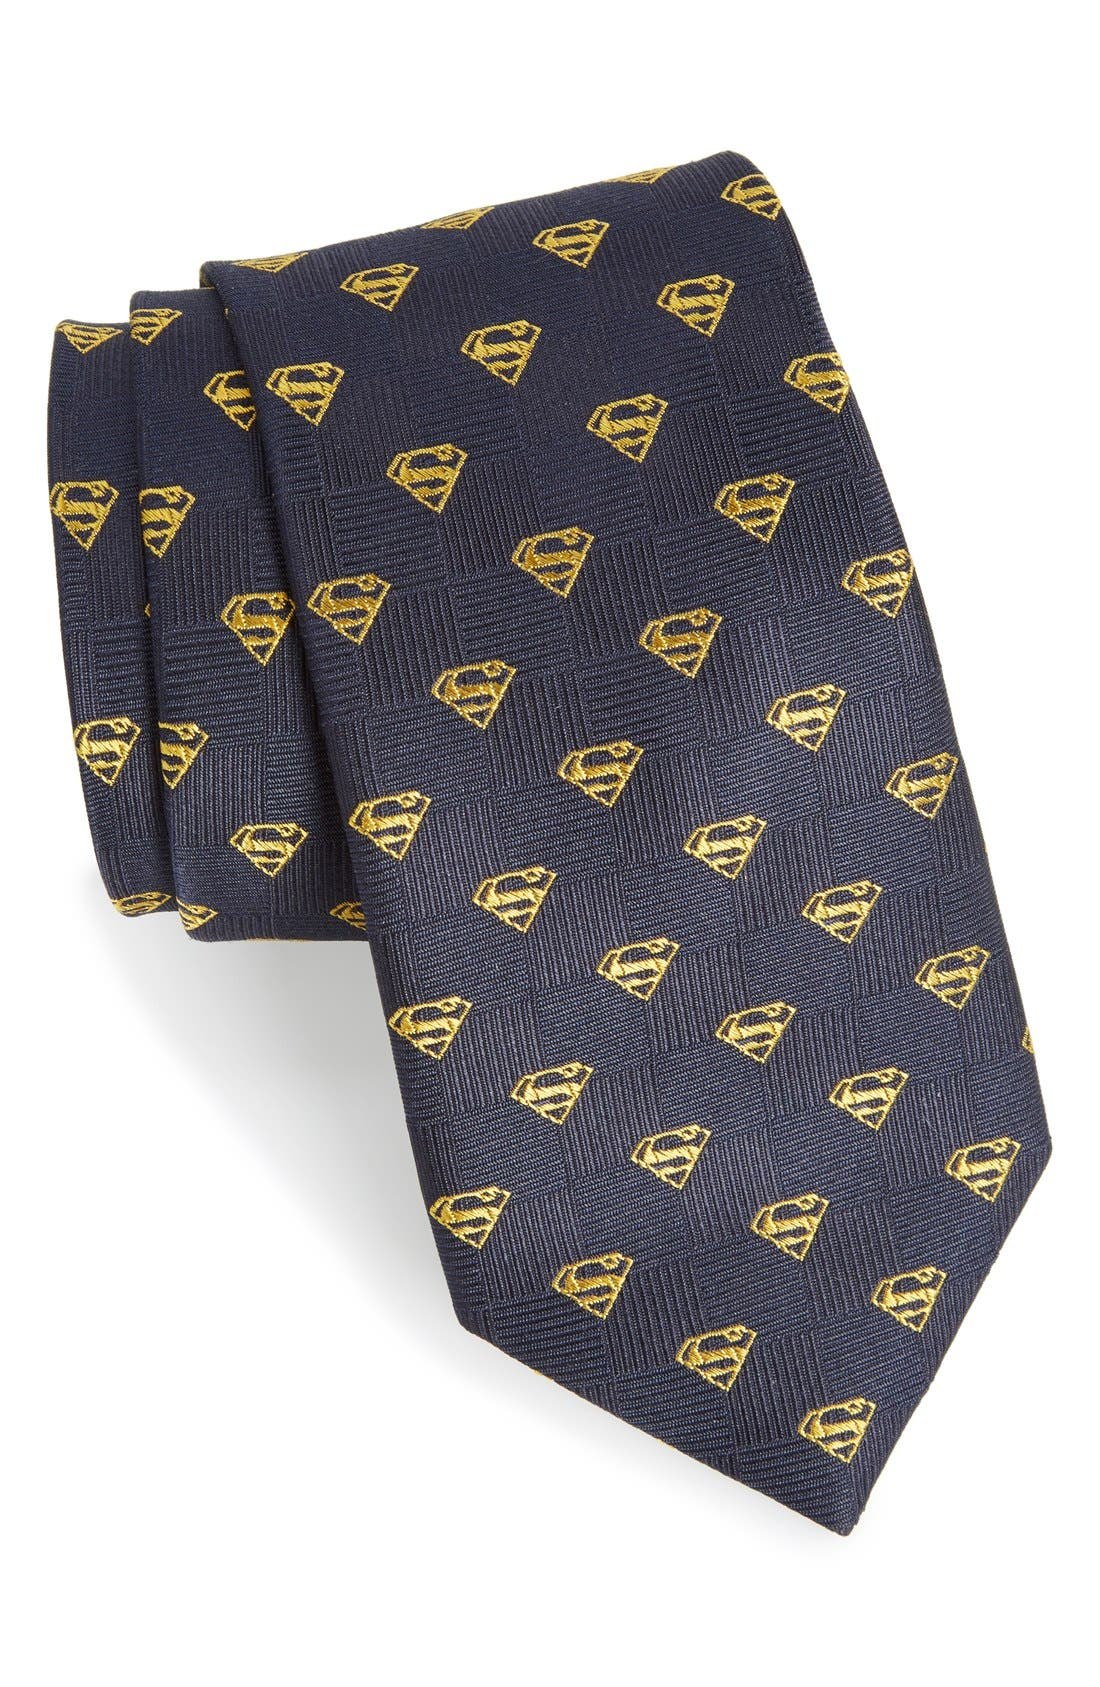 CUFFLINKS, INC. 'Superman Shield' Silk Tie